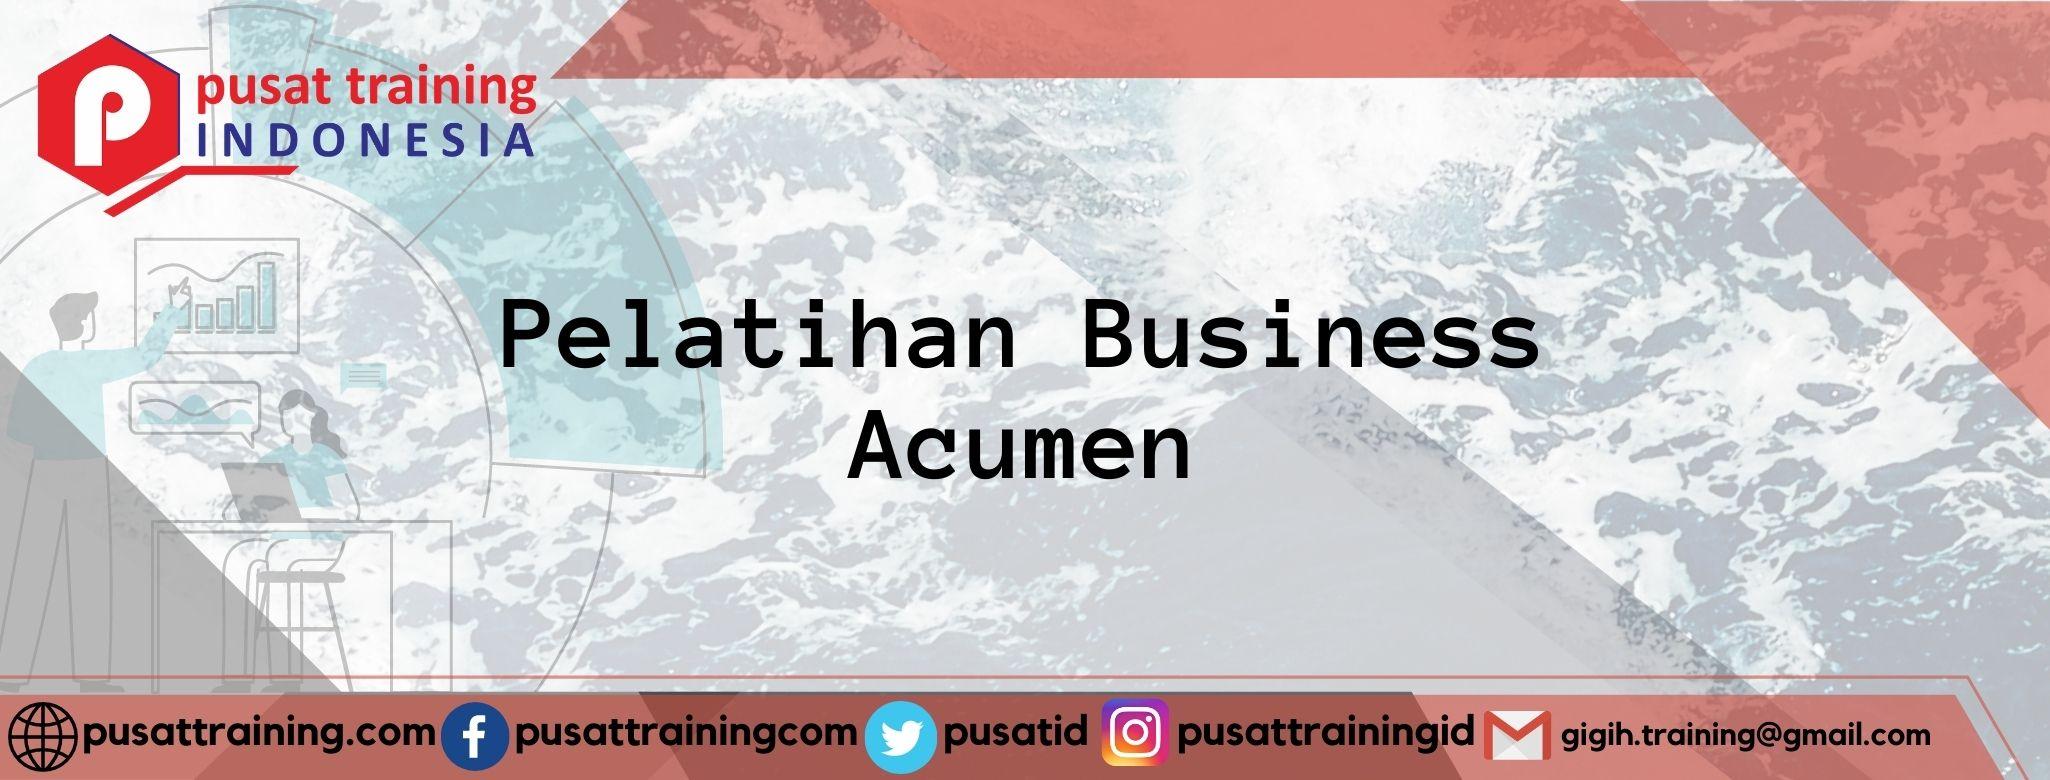 Pelatihan Business Acumen